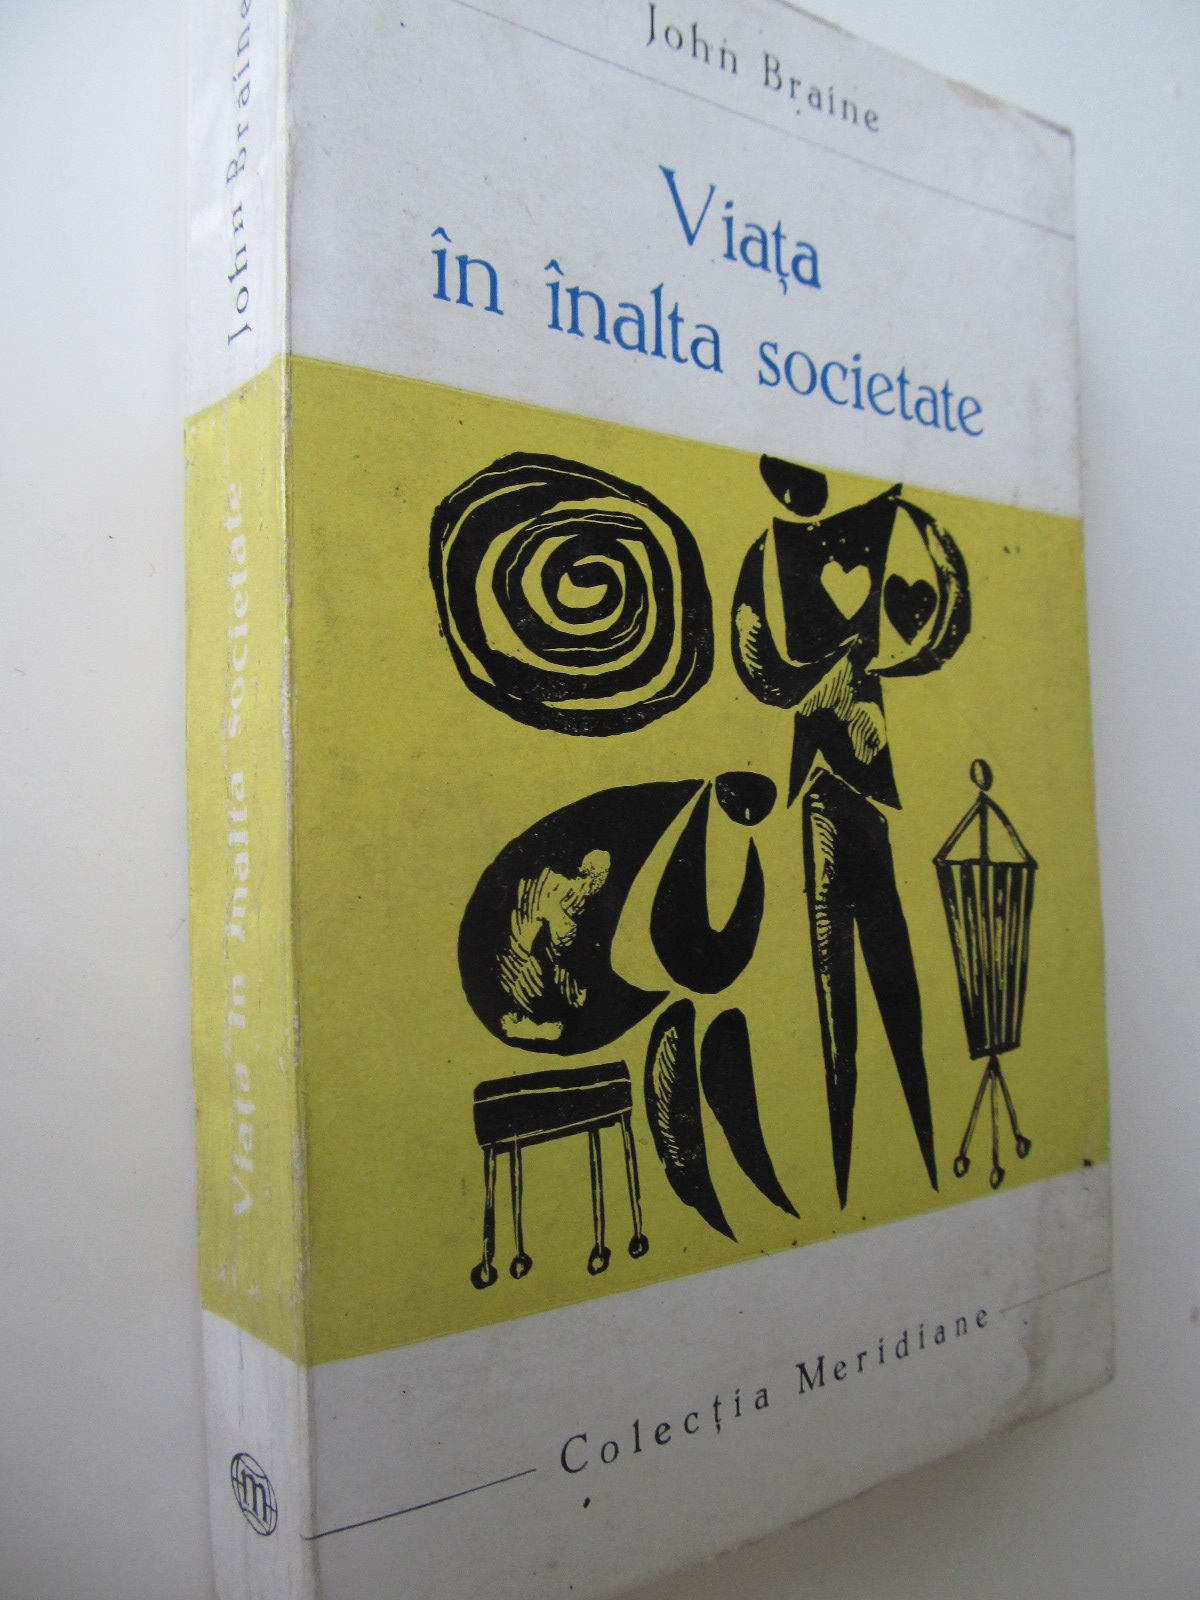 Viata in inalta societate - John Braine | Detalii carte